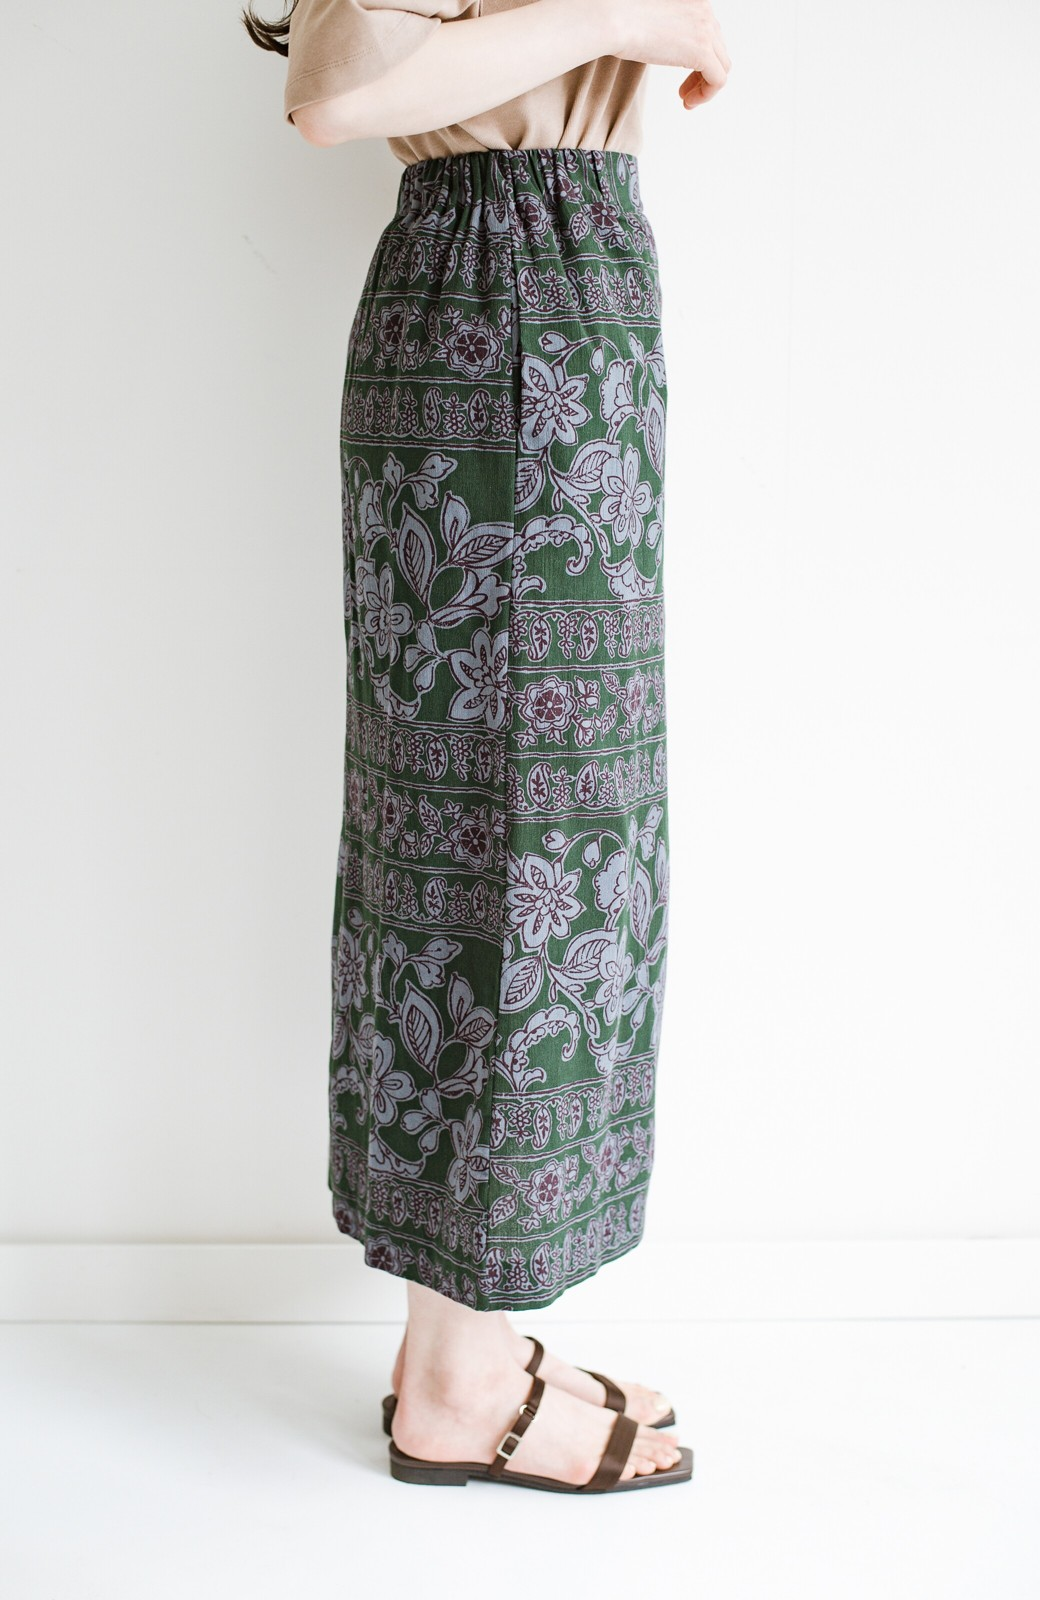 haco! 京都の浴衣屋さんと作った浴衣生地のセミタイトスカート <グリーン系その他>の商品写真6